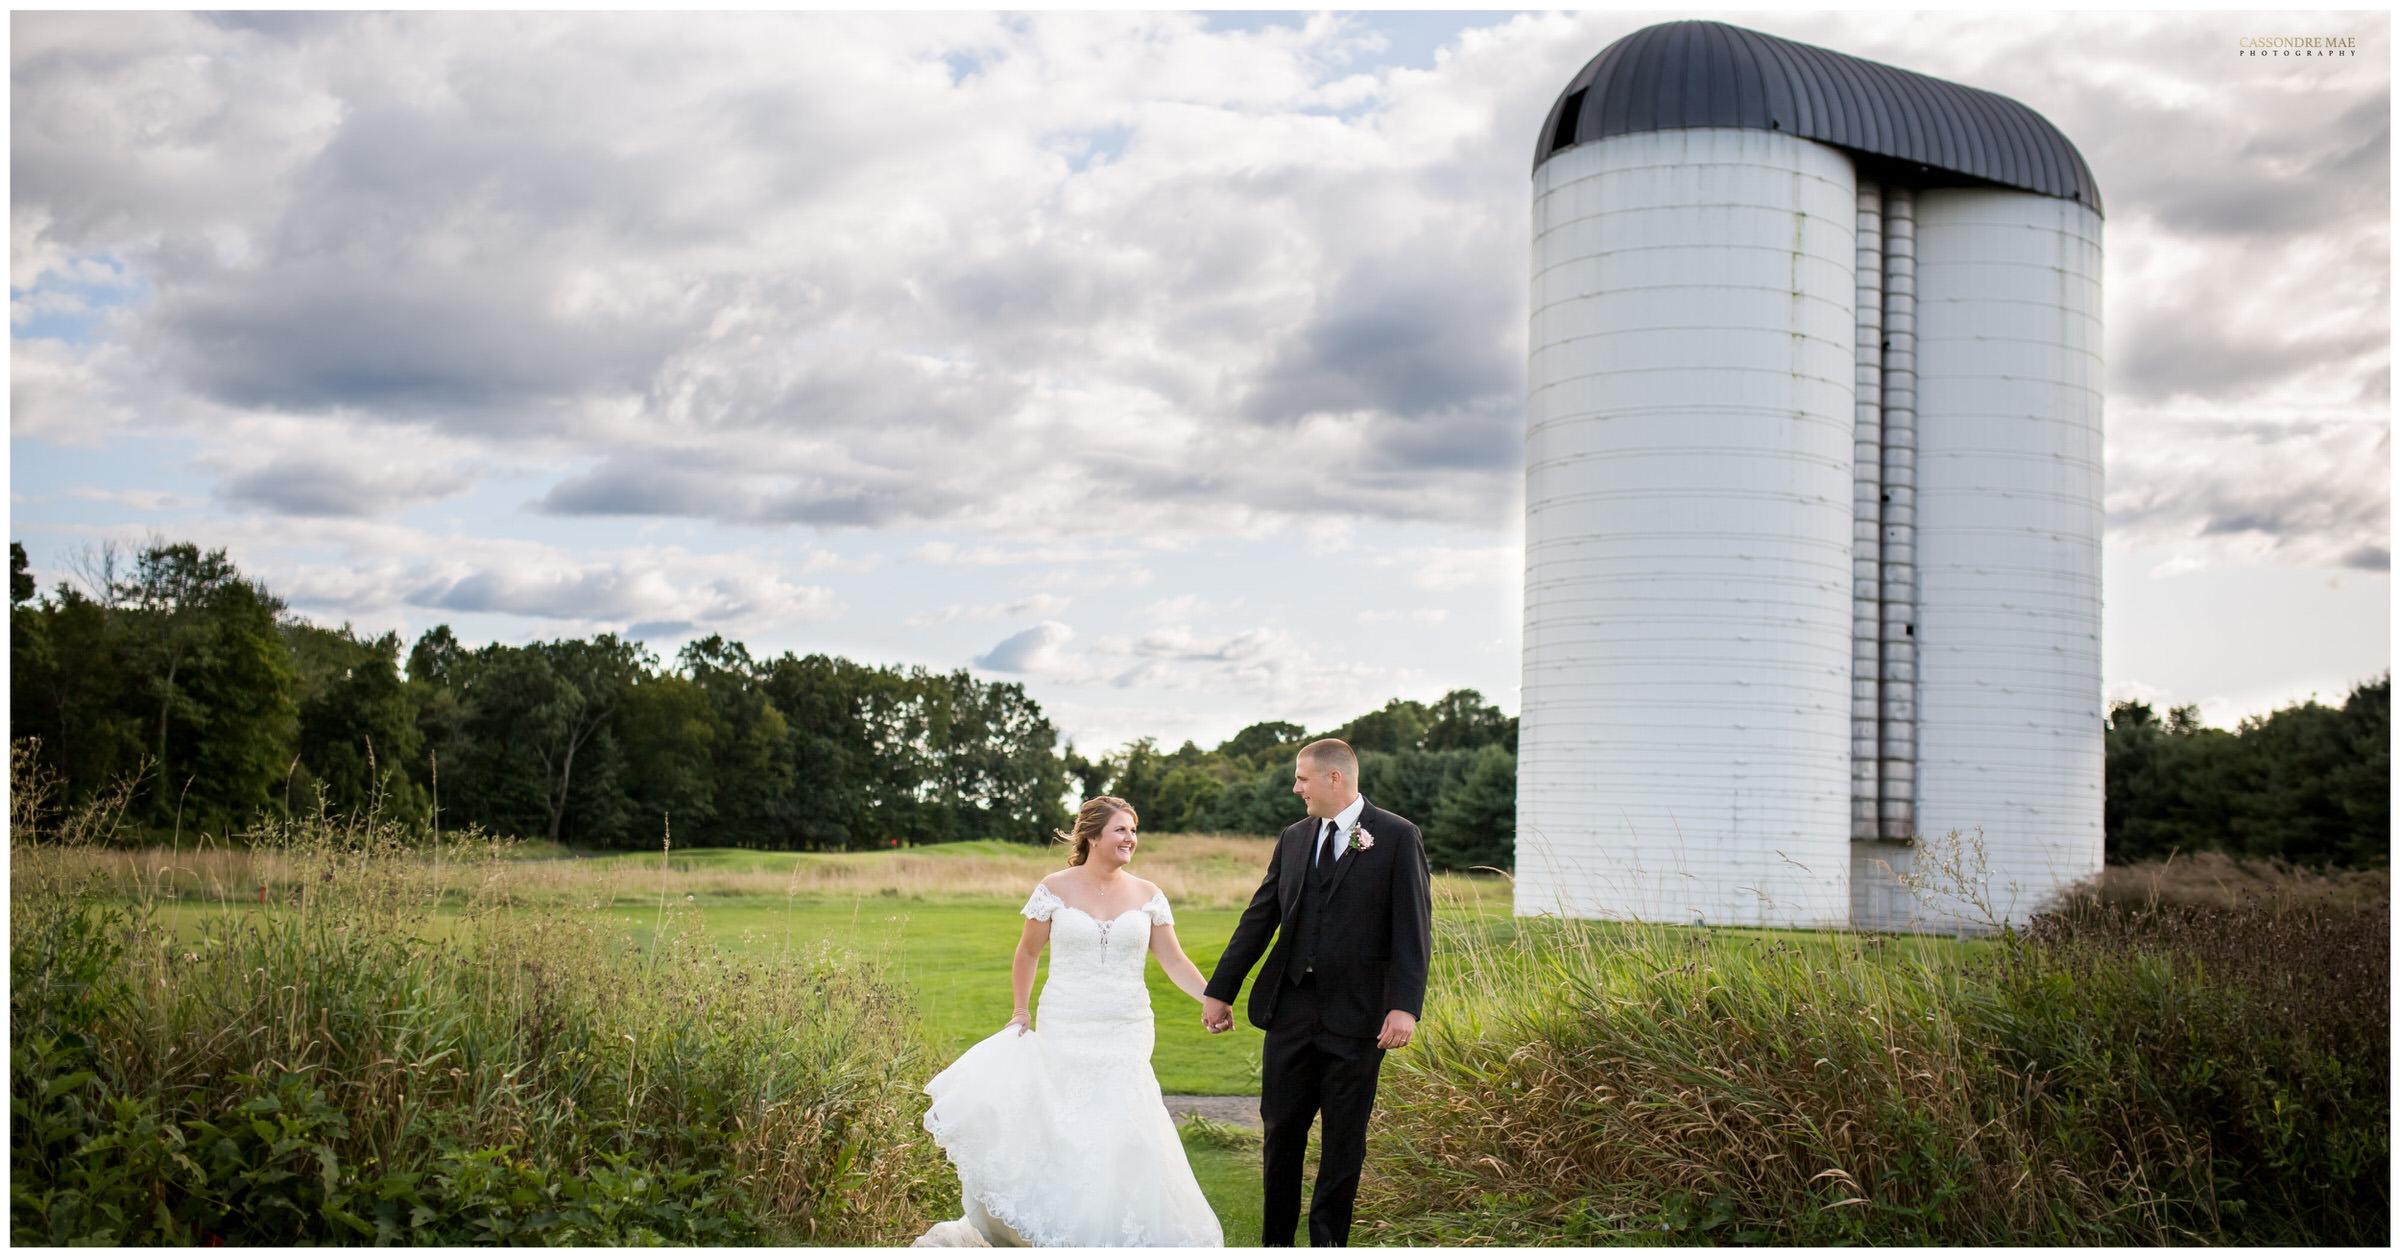 Cassondre Mae Photography Hudson Valley Wedding Photographer 10.jpg